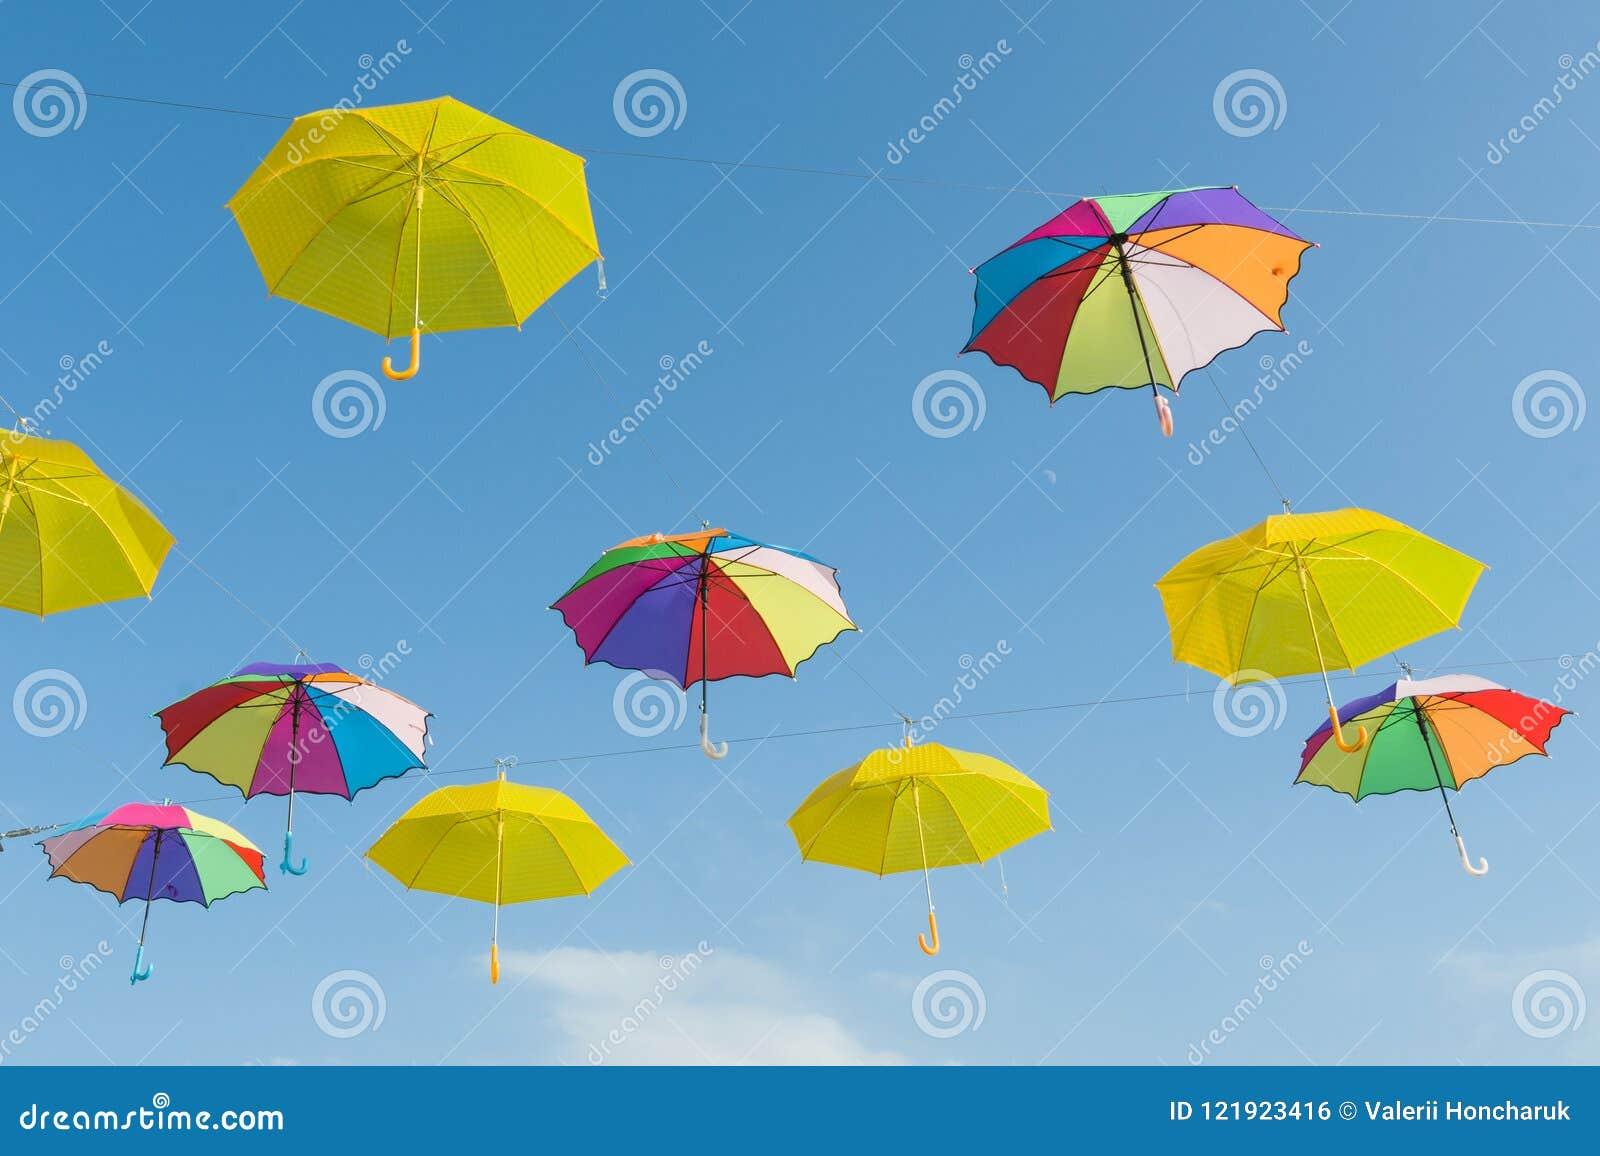 b7e10fa61 Symbol of summer, many open multi-colored umbrellas on sky background.